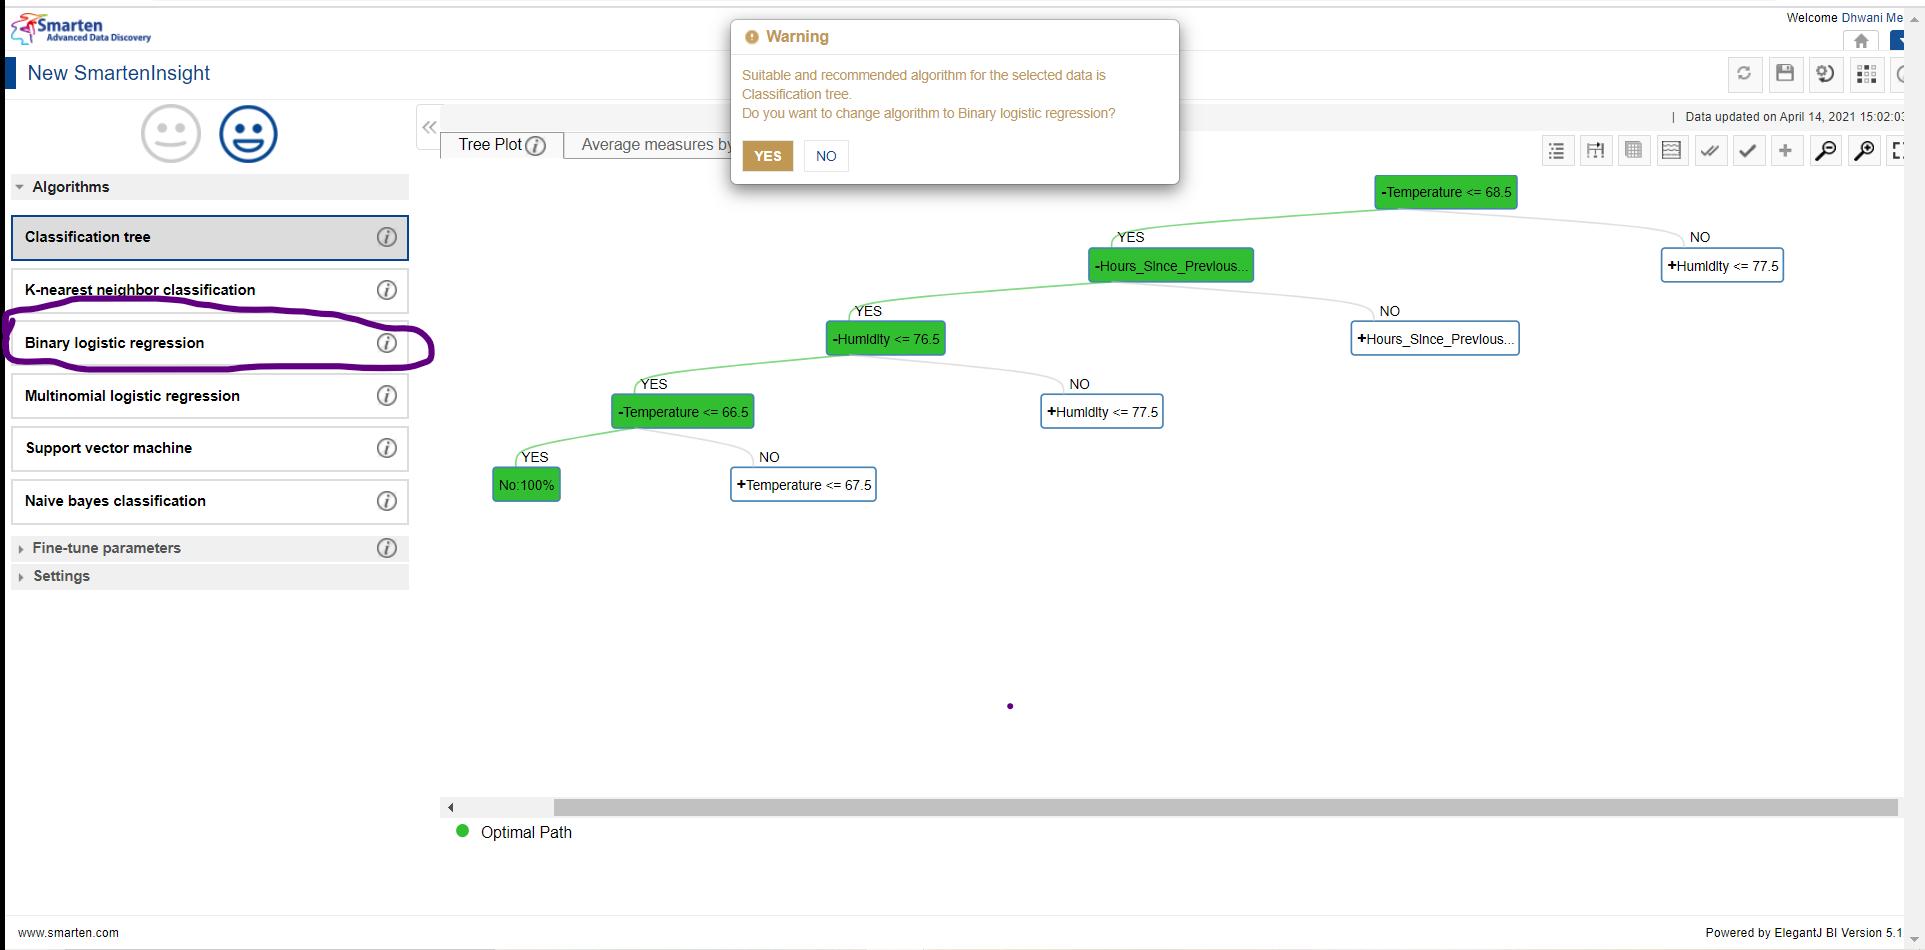 explore-the-machine-maintenance-outcomes-based-upon-binary-logistic-regression-algorithm